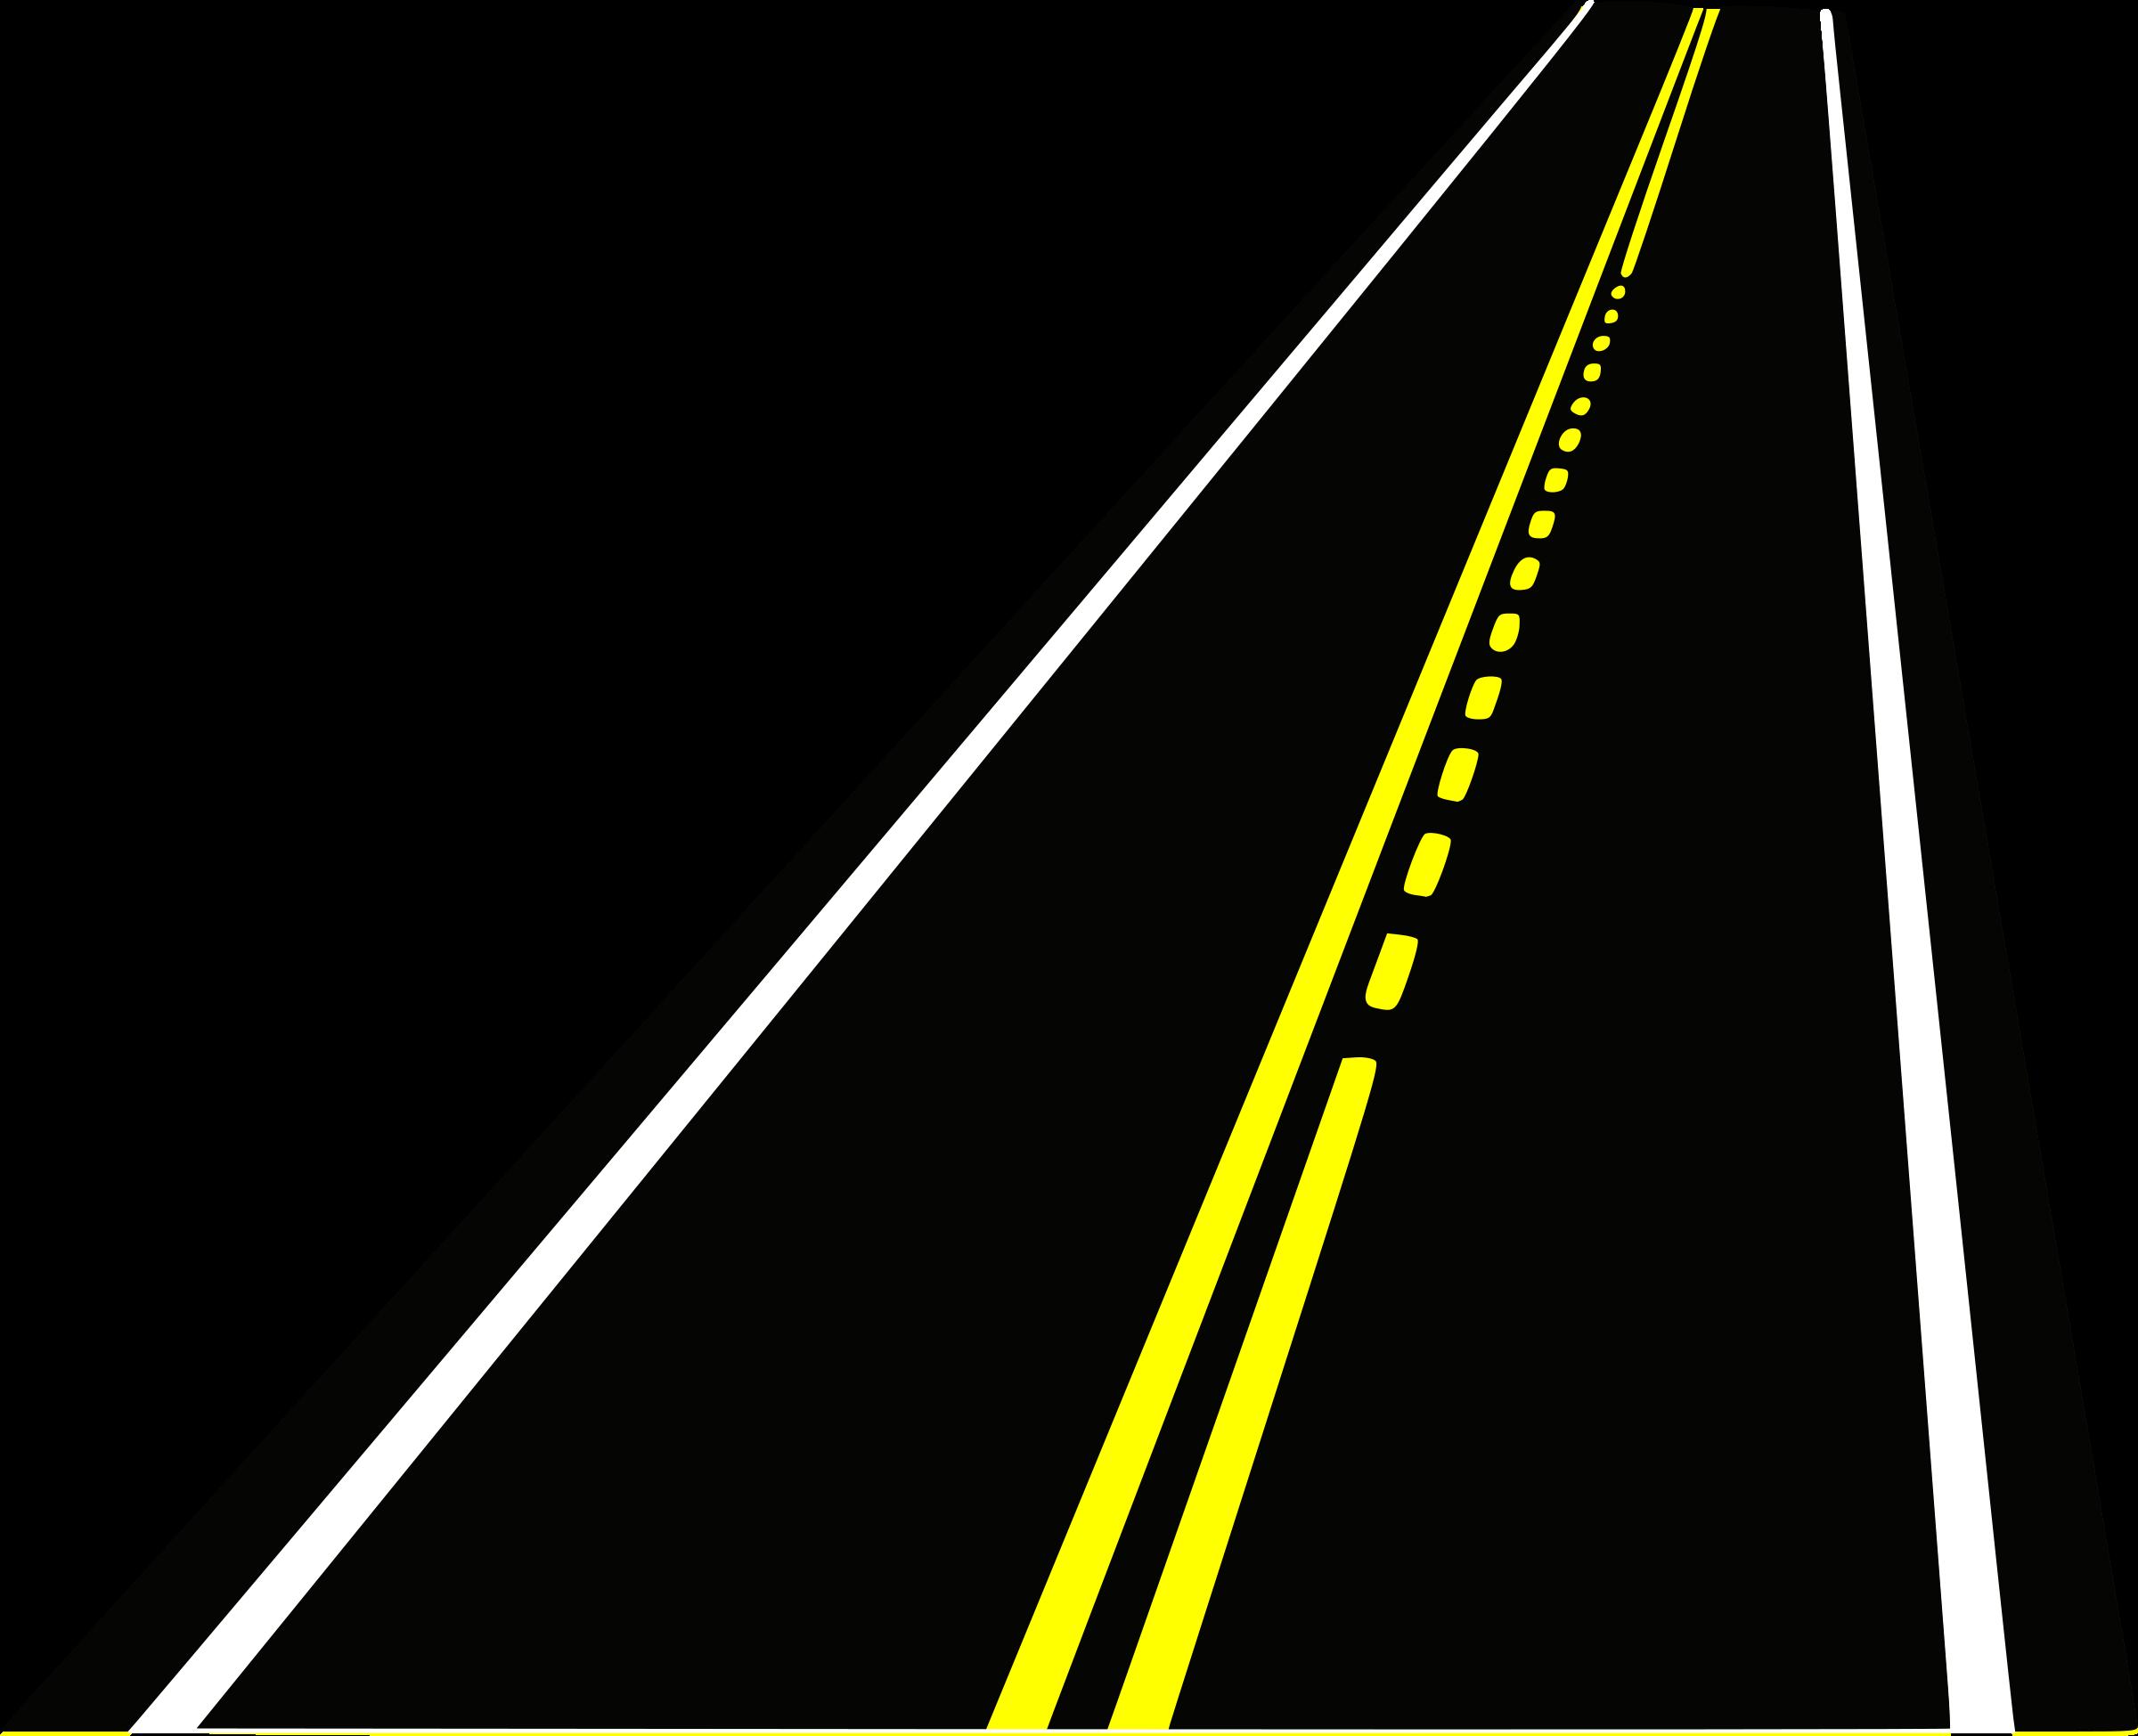 Road Background Clip Art Roadway 20clipart